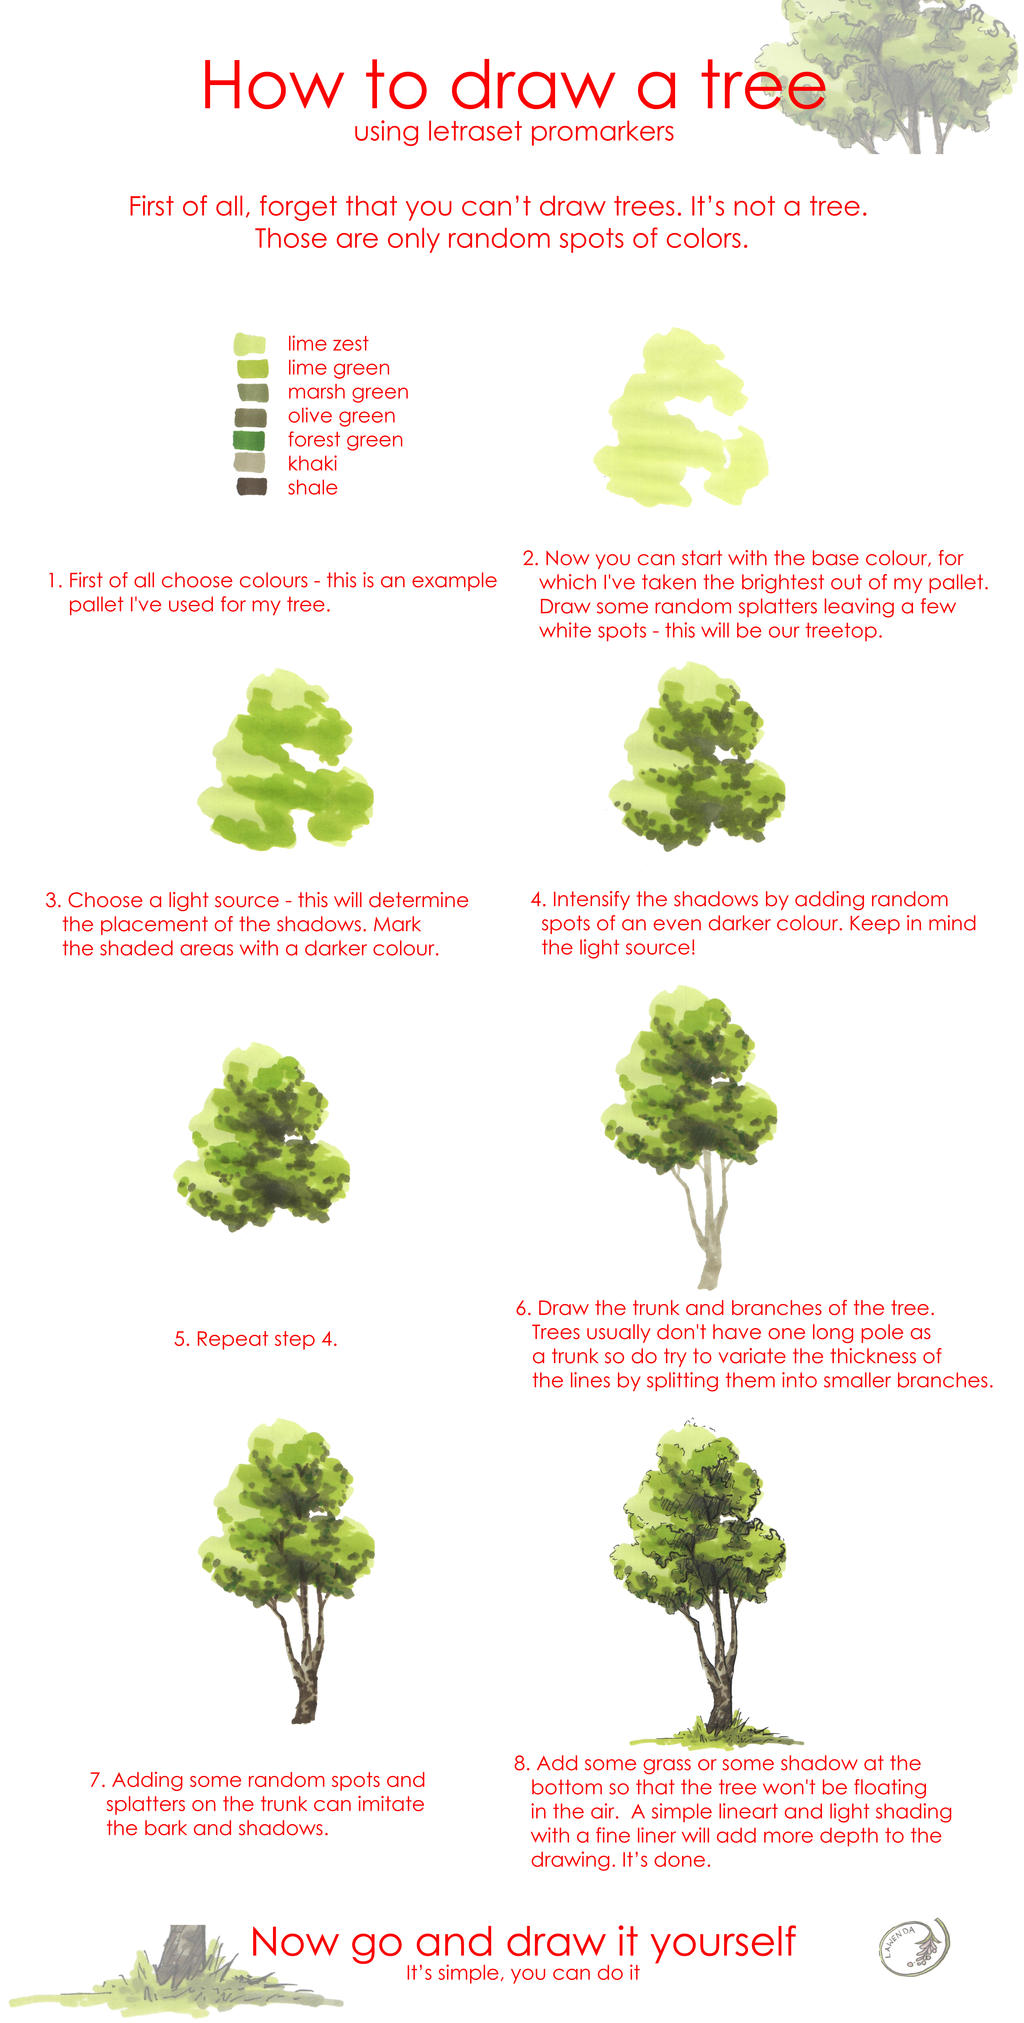 Tree drawing tutorial by Morpho-Deidamia